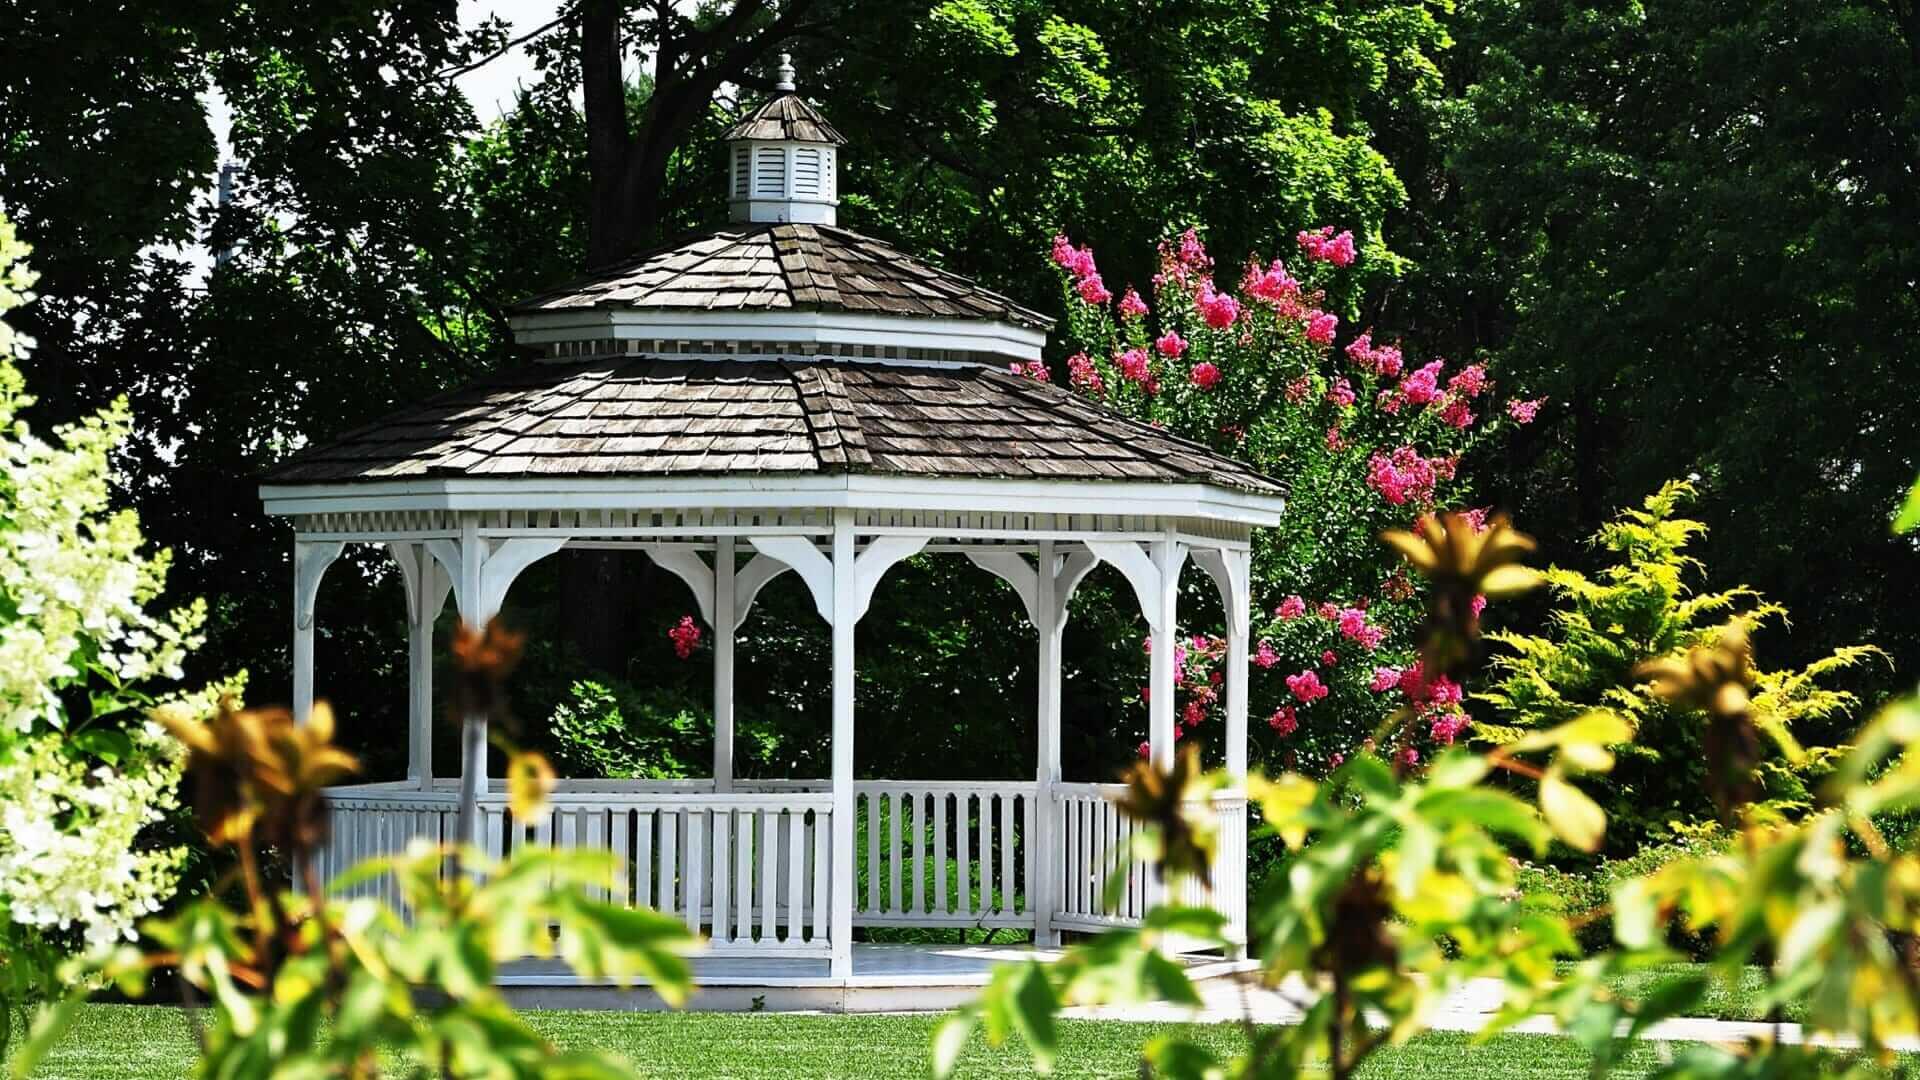 Hochwertige Gartenpavillons mit festem Dach